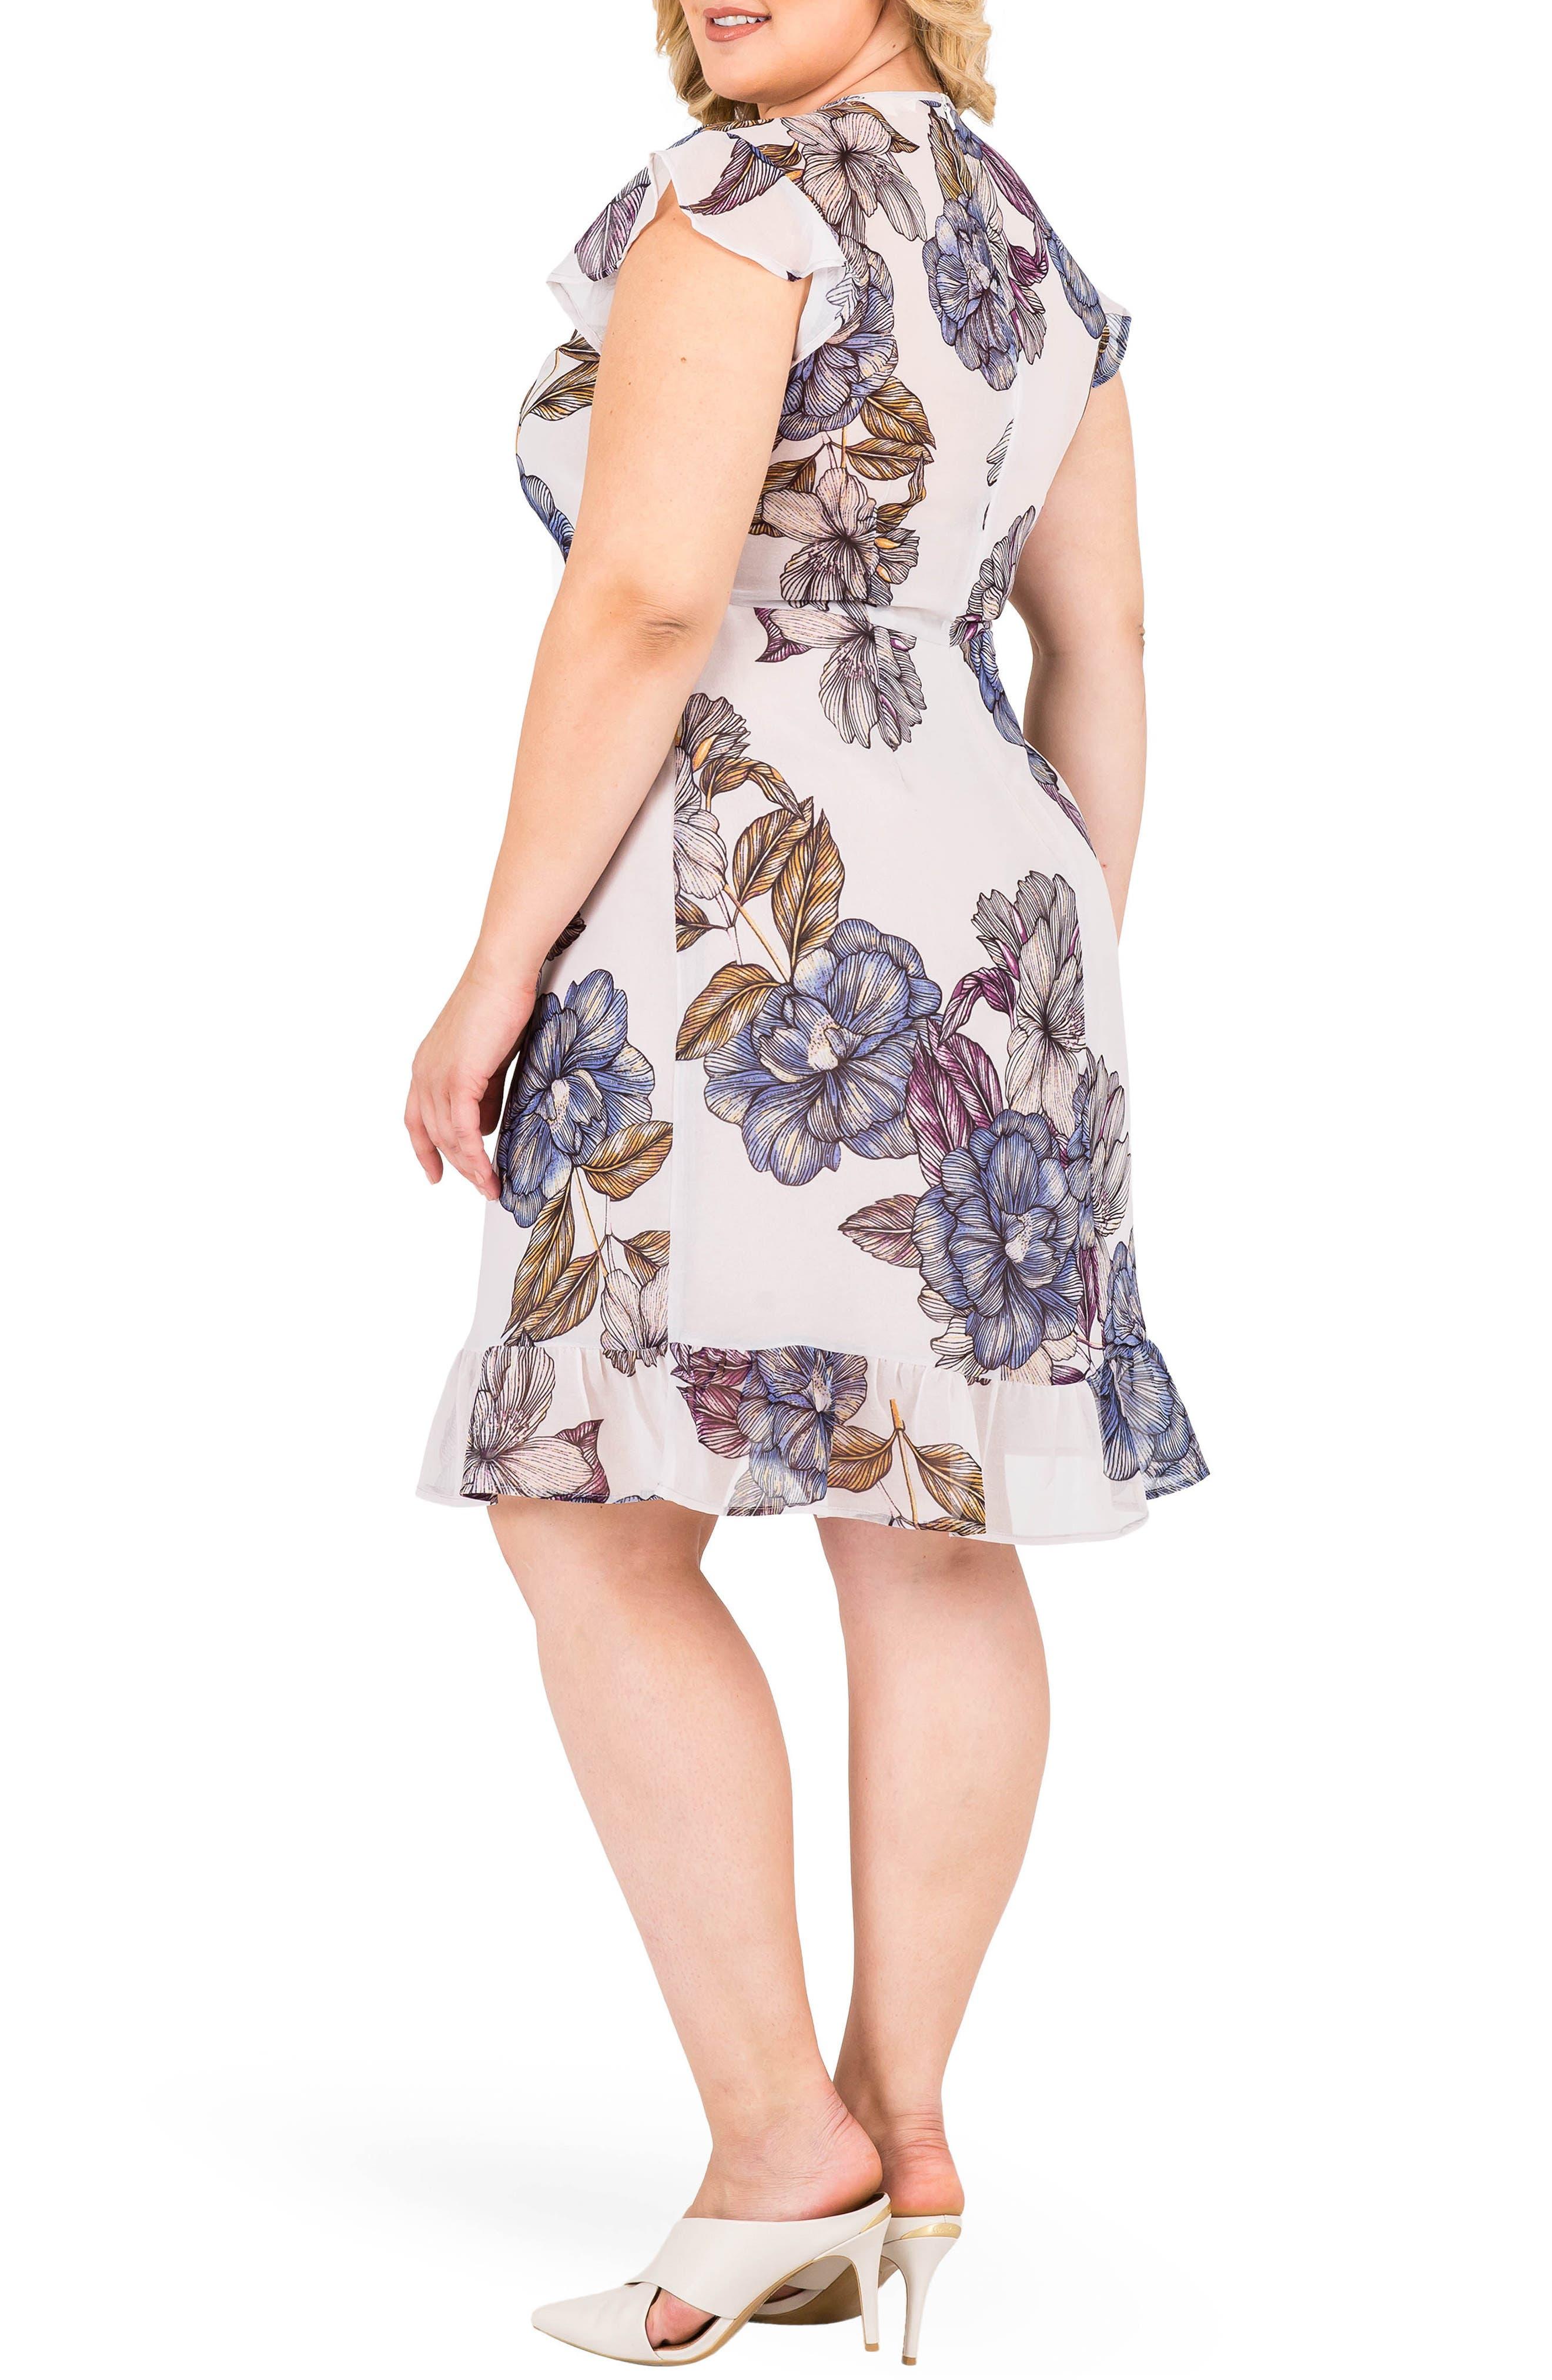 Dion Floral A-Line Dress,                             Alternate thumbnail 3, color,                             LIGHT GRAY FLORAL PRINT